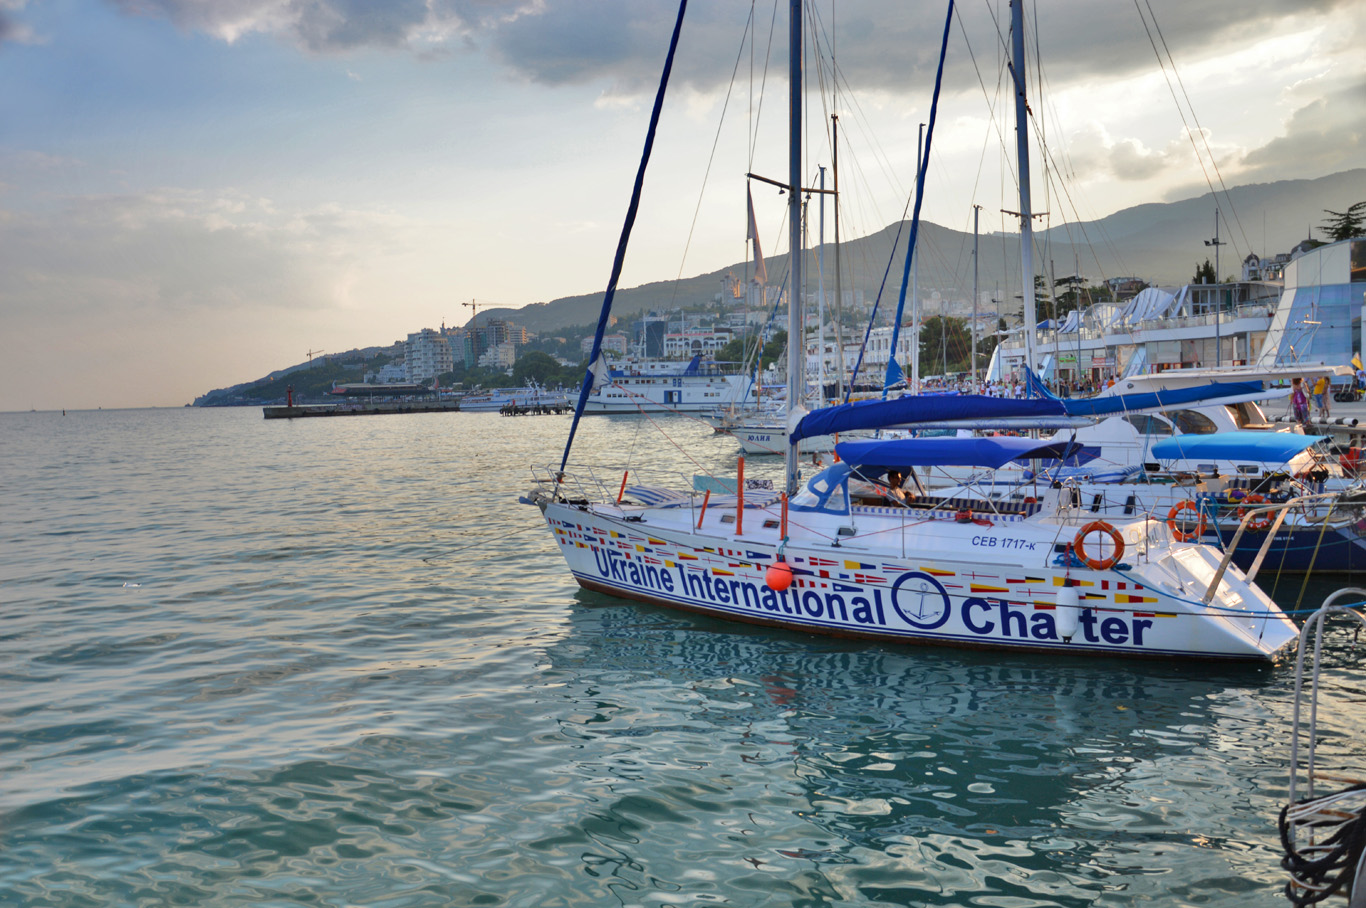 The Black Sea in Yalta